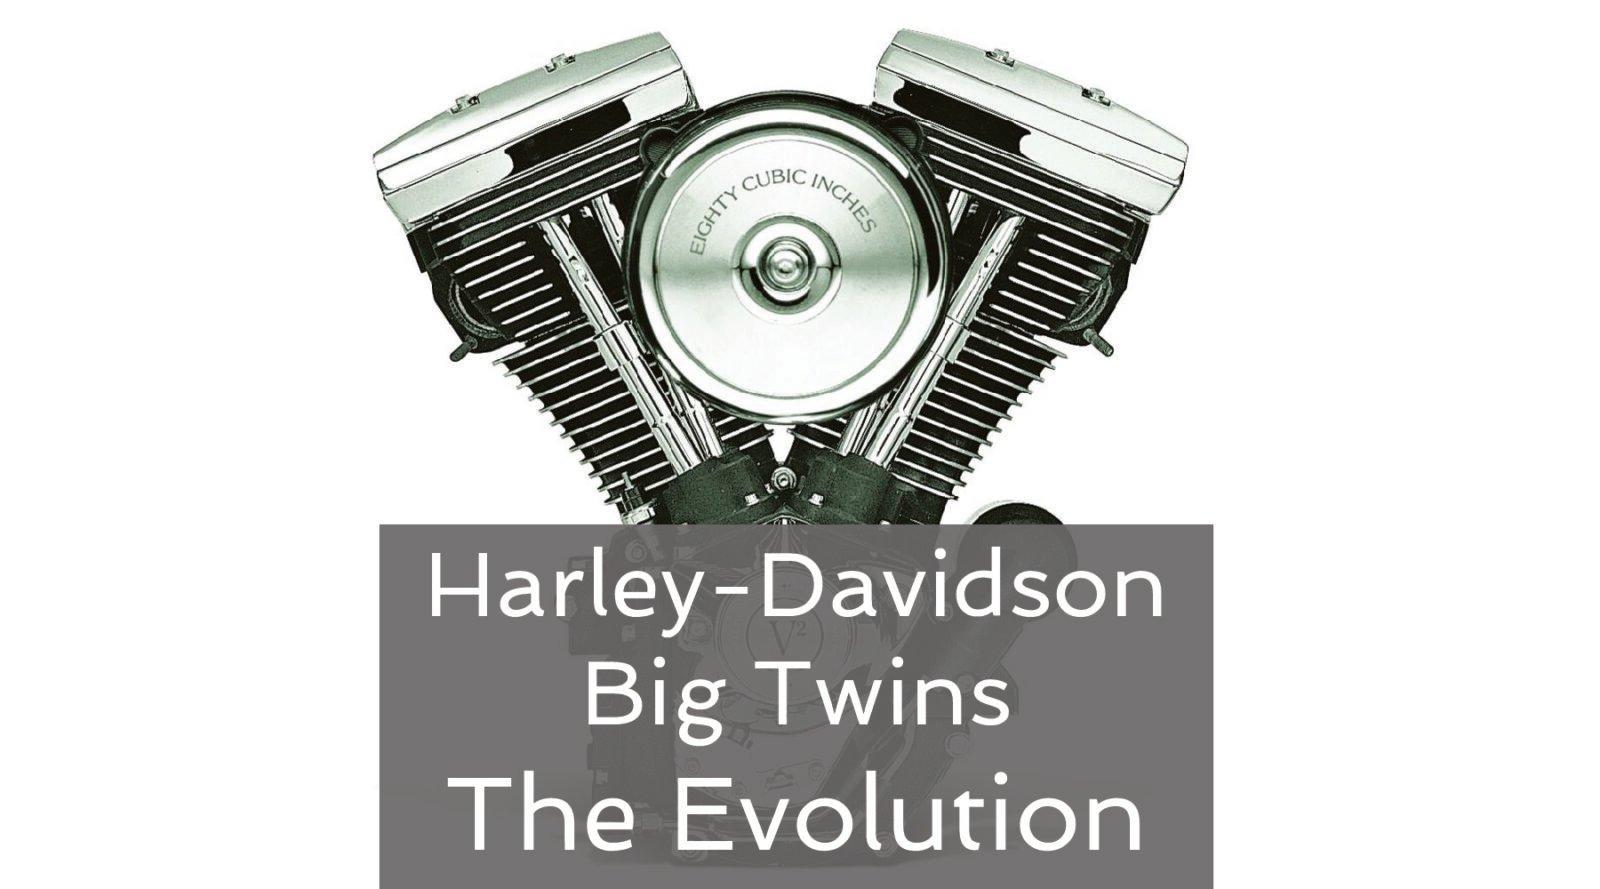 Harley-Davidson Big Twins – The Evolution on harley oil pump check ball, harley solenoid diagram, harley clutch basket removal, harley primary diagram, harley motor diagram, harley starter clutch removal, harley evo oil line diagram, harley motor sizes, harley davidson evolution motor, harley-davidson evo clutch diagram, harley-davidson engine diagram, harley davidson starter solenoid, harley evo starter diagram, harley-davidson oil pump diagram, harley oil pump problems, harley blueprints, blueprint engine diagram, harley parts diagram, harley keihin carb diagram, harley evolution timing marks,